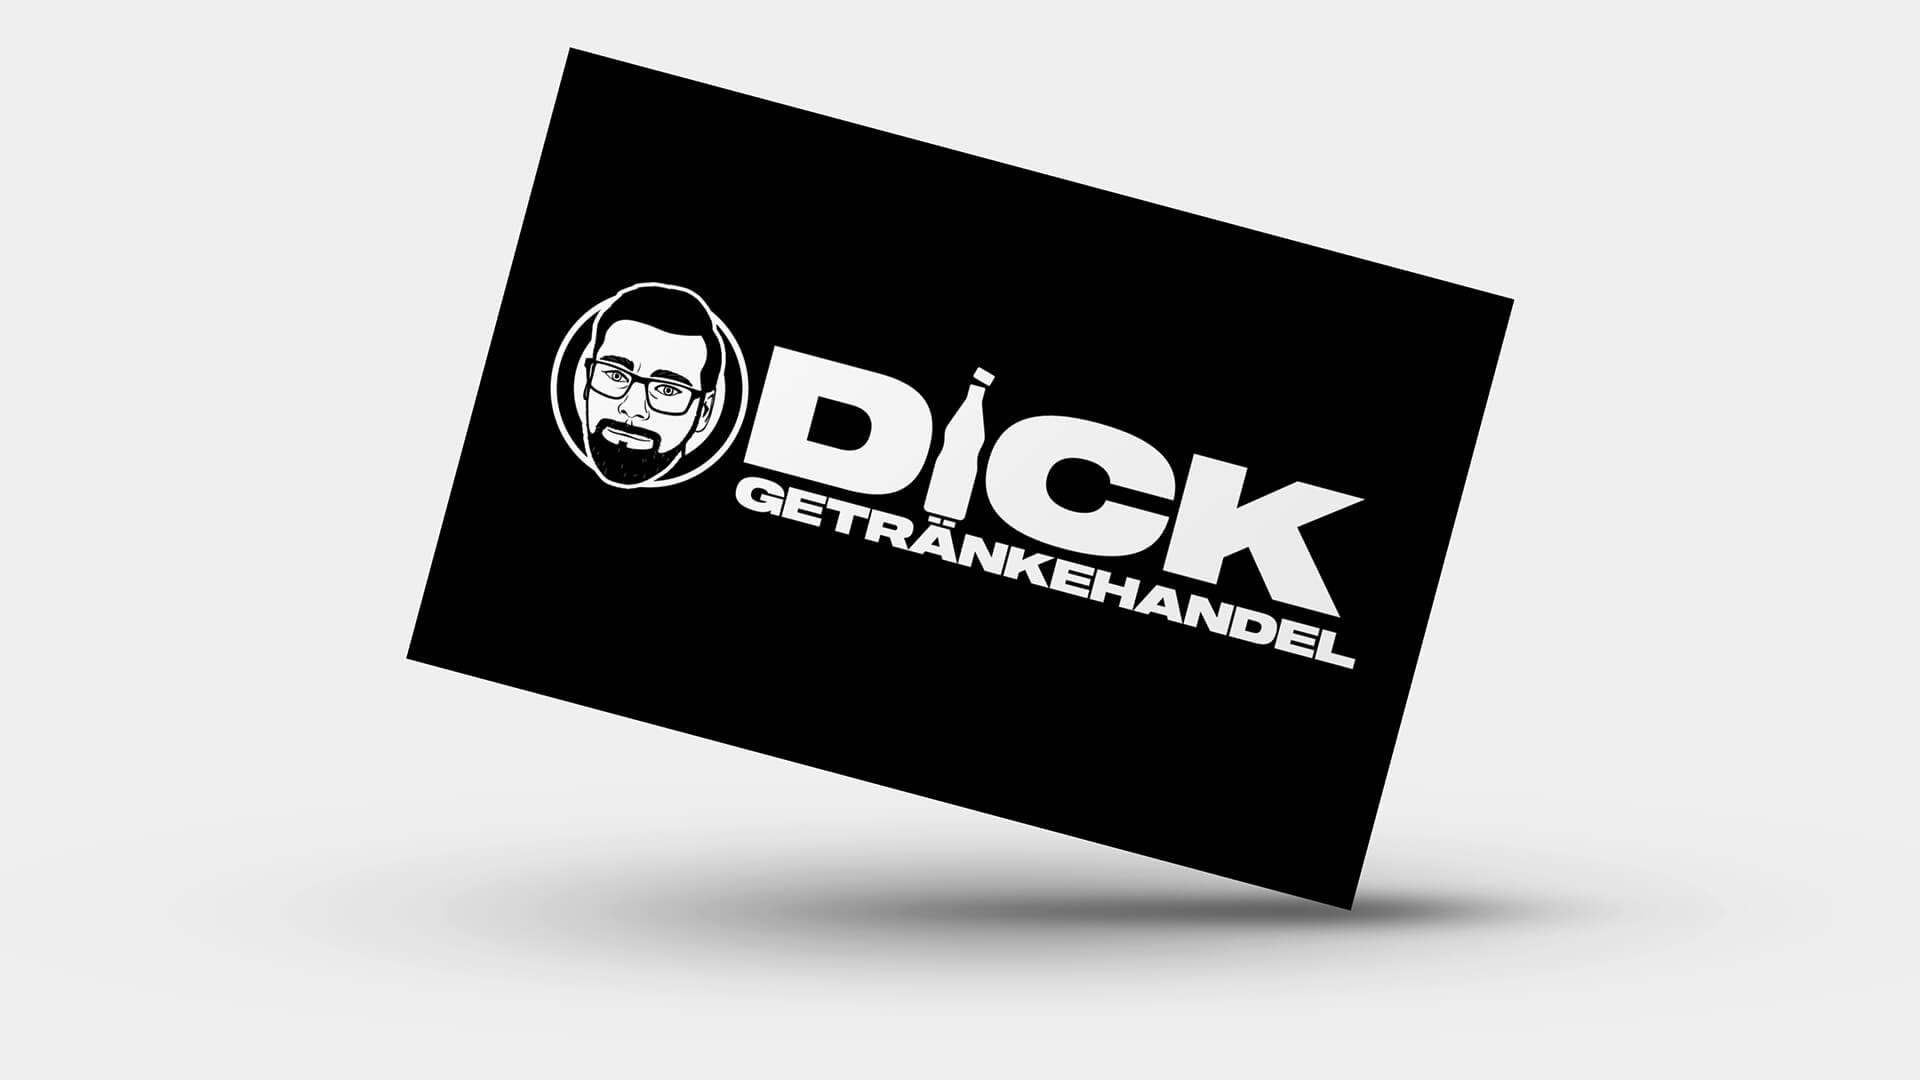 Dick Getränkehandel Logo